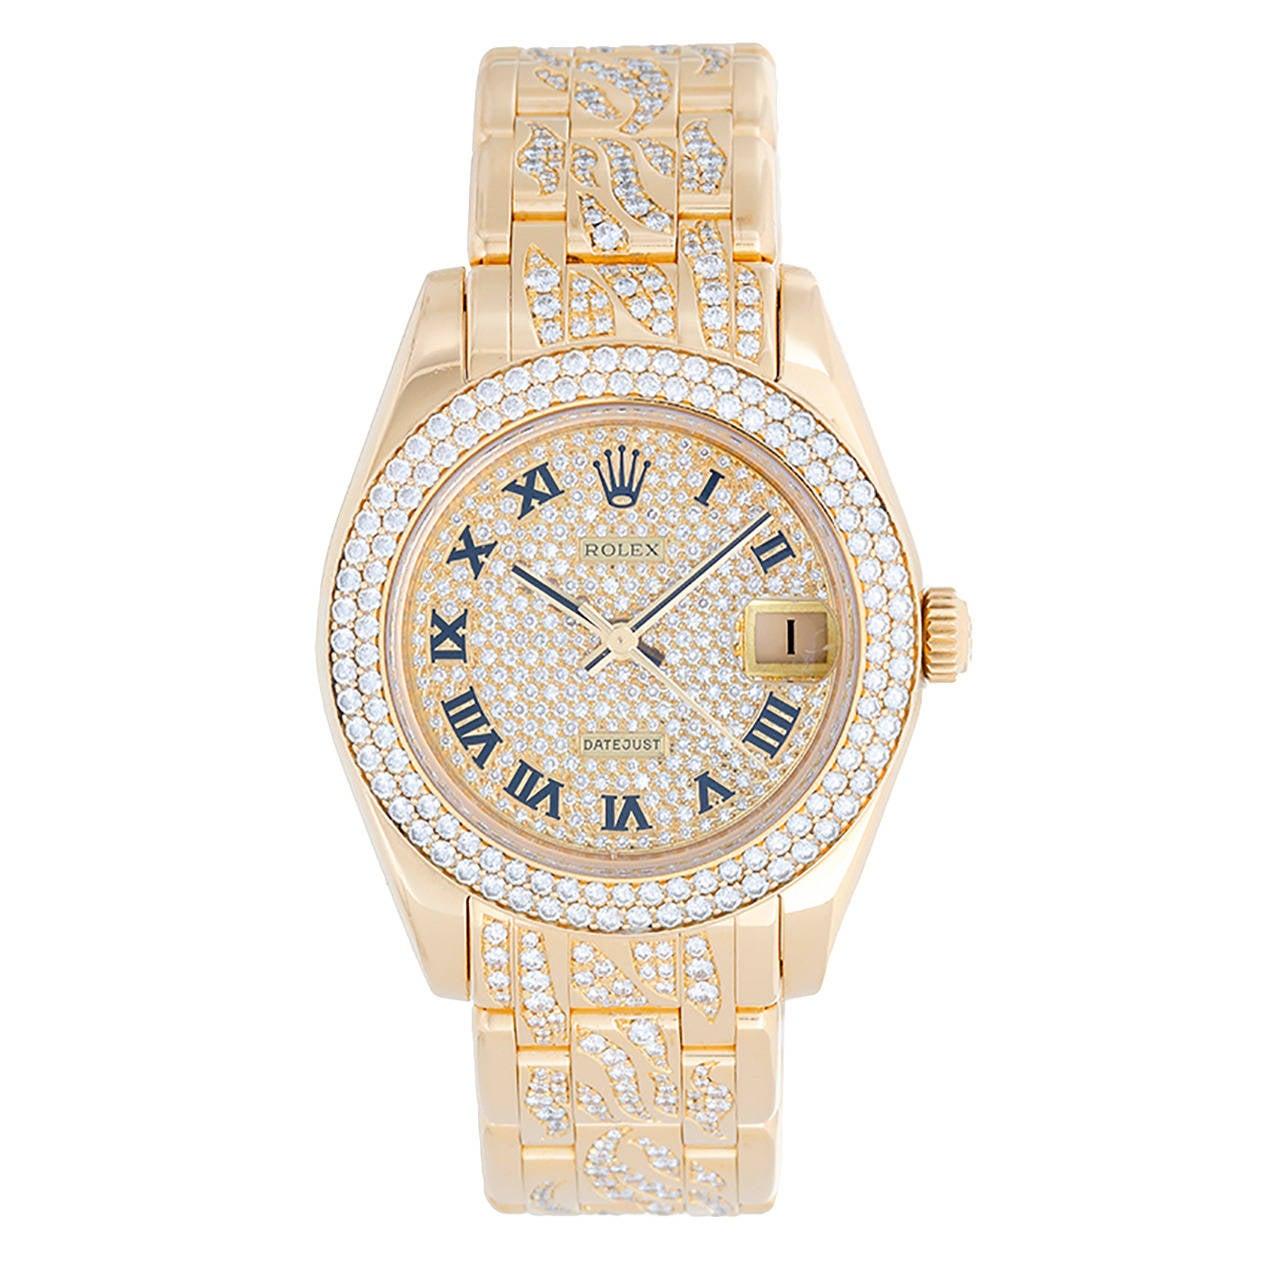 Rolex Yellow Gold Diamond Pearlmaster Masterpiece Midsize Wristwatch Ref 81338 1